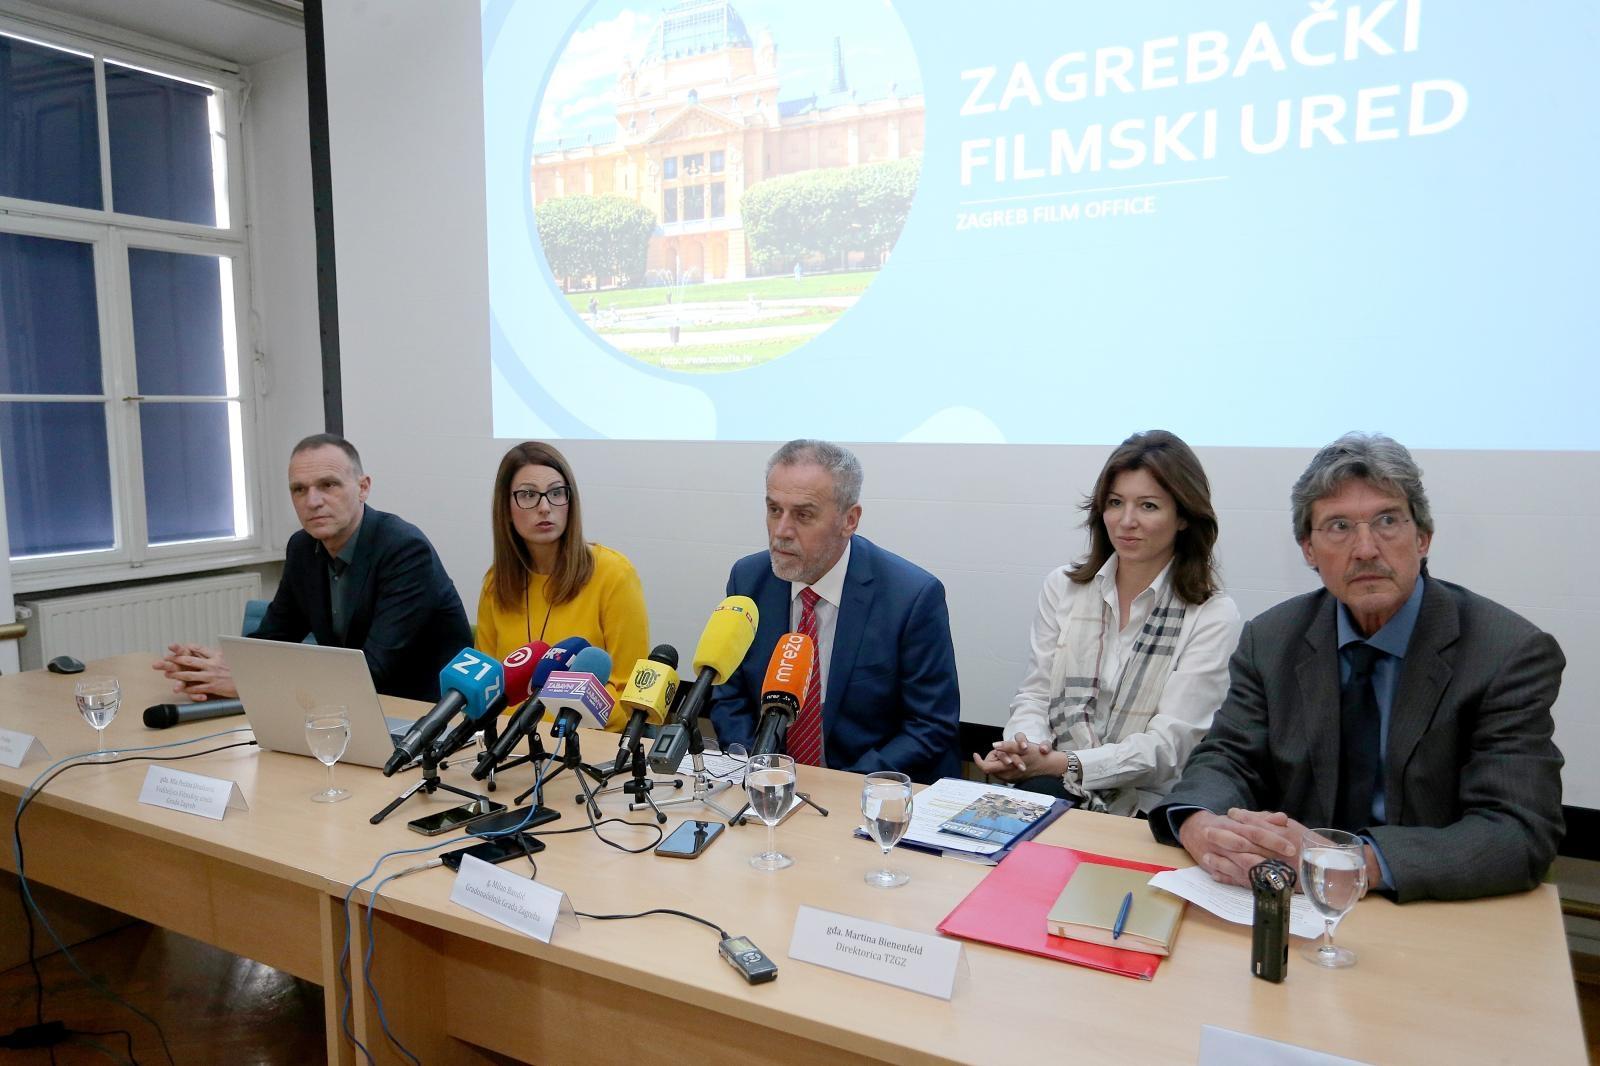 Predstavljene aktivnosti i vodstvo Filmskog ureda Grada Zagreba